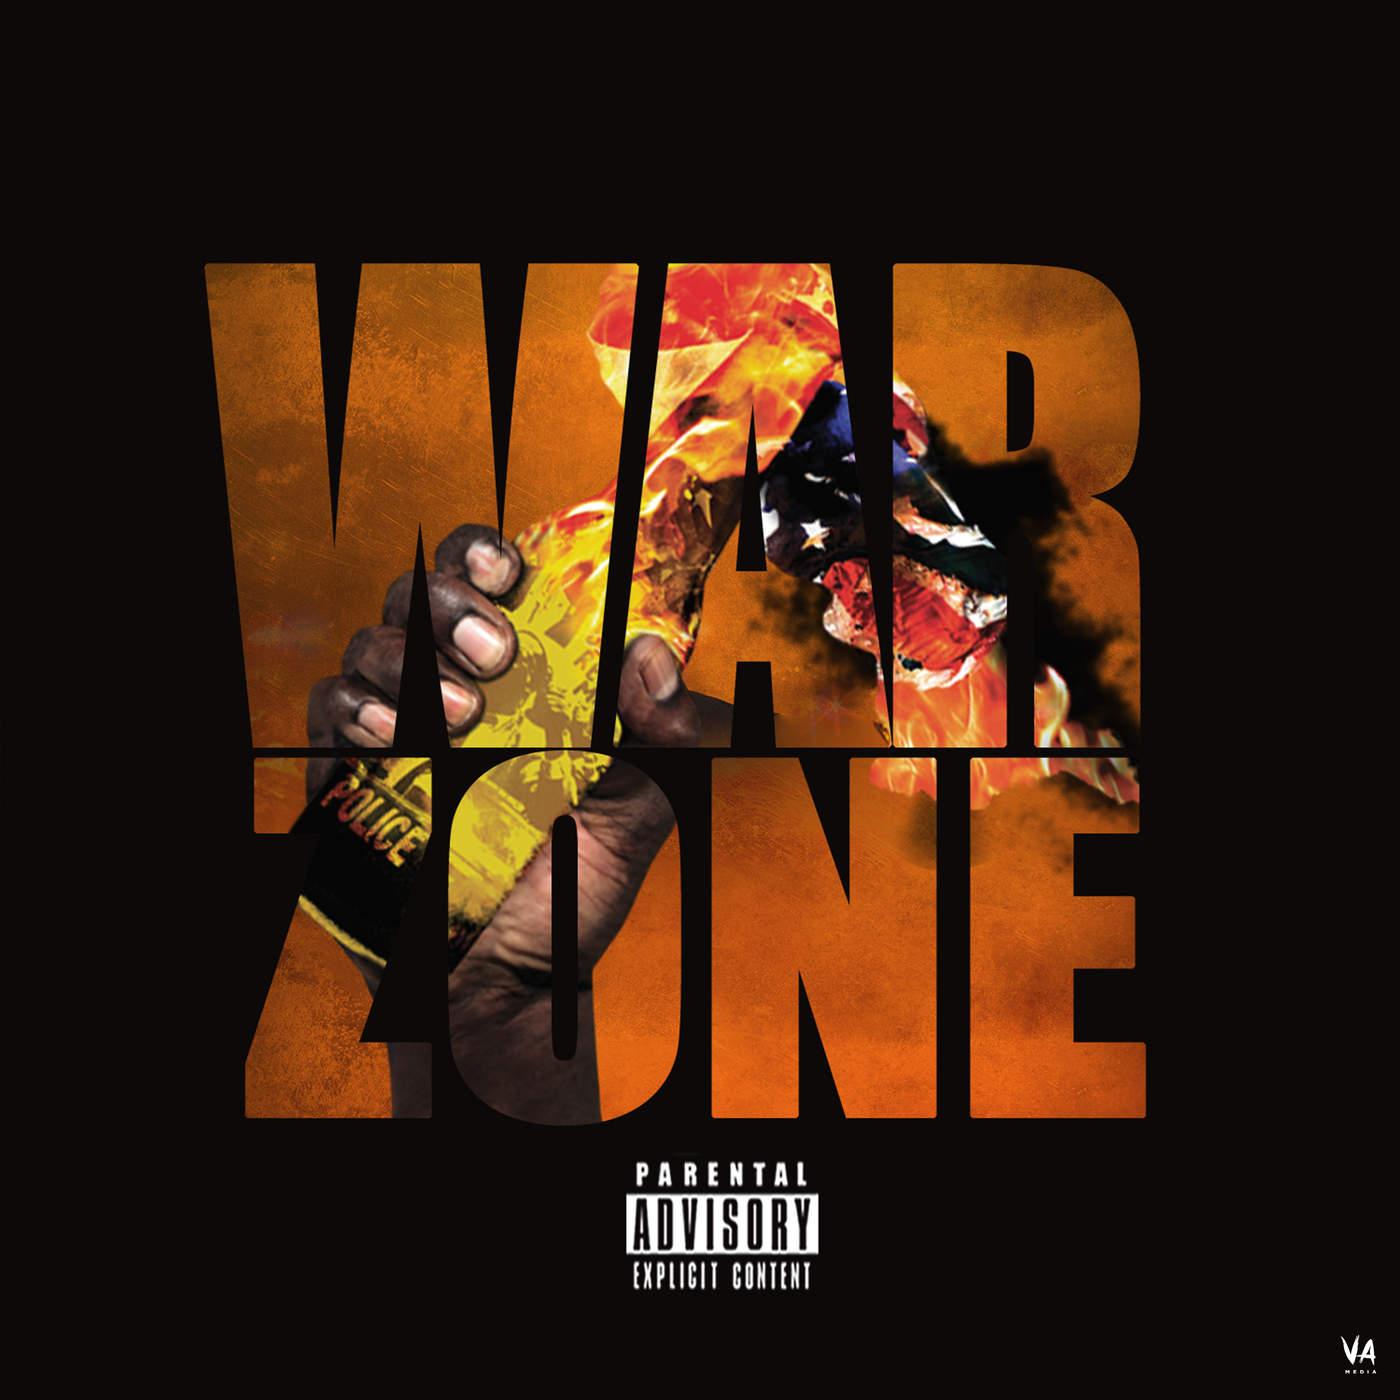 T.I. - Warzone - Single Cover